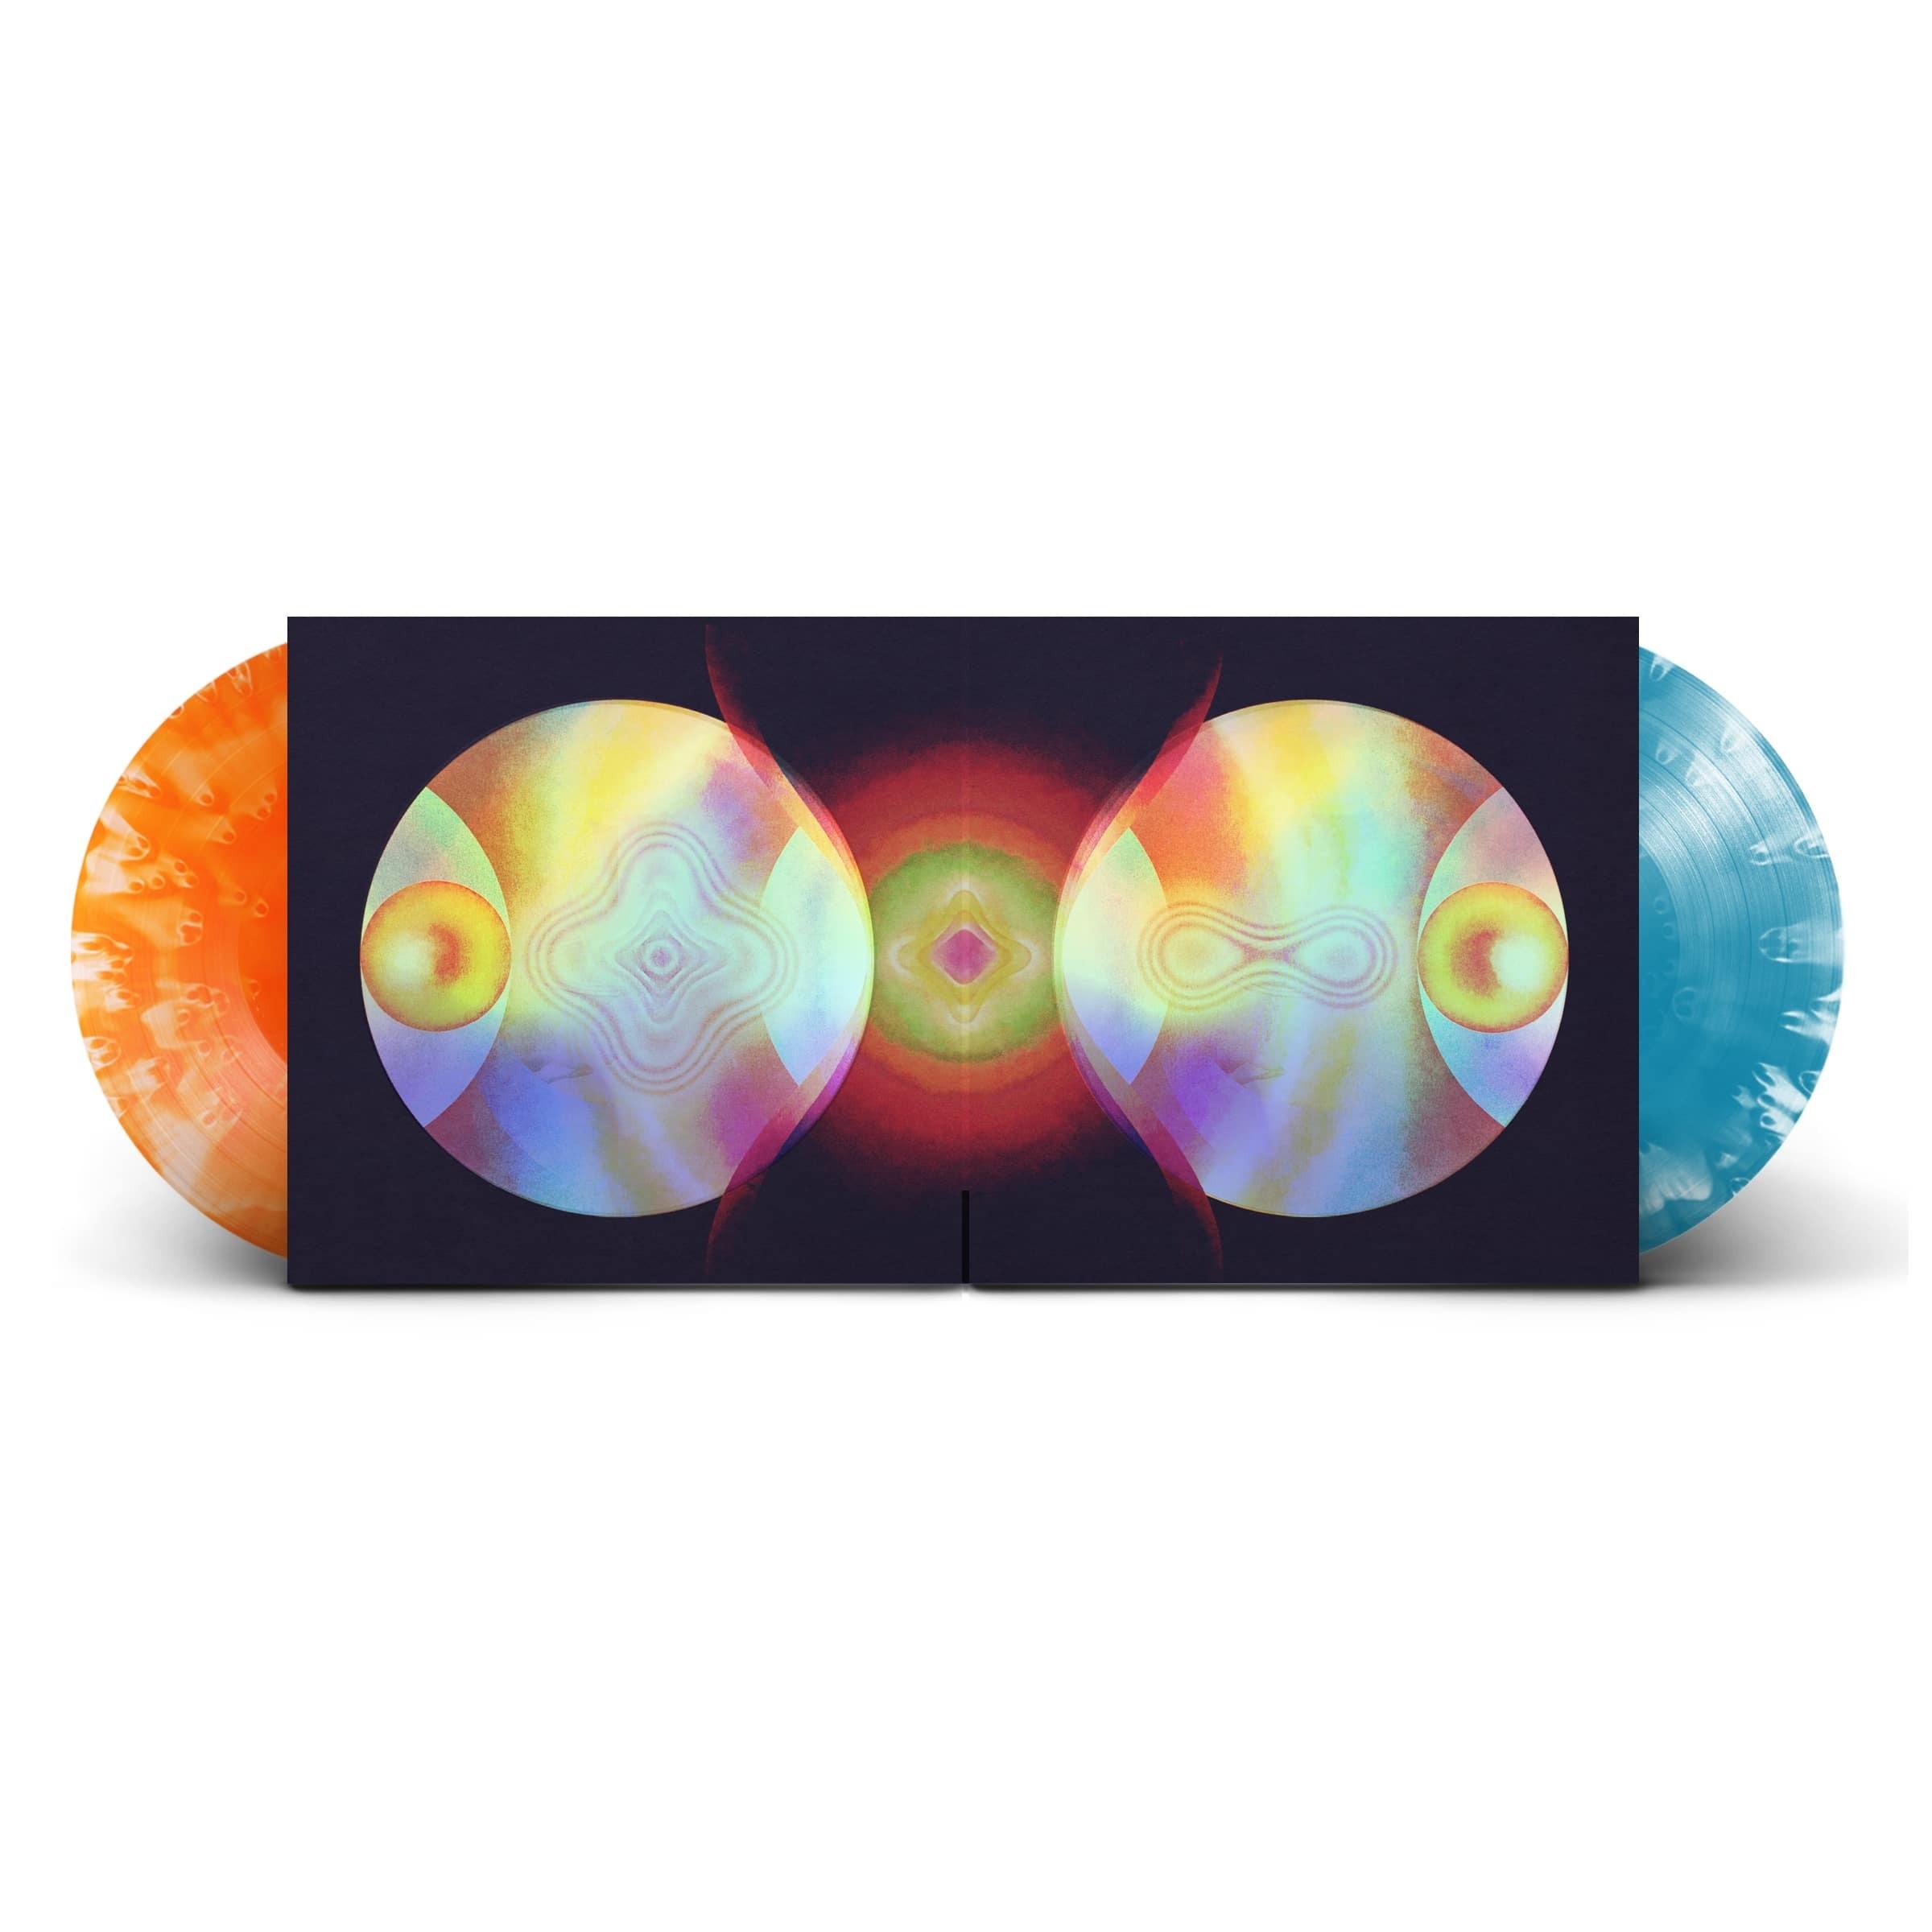 My Morning Jacket - 'My Morning Jacket' 2xLP 180-Gram Deluxe Color Vinyl